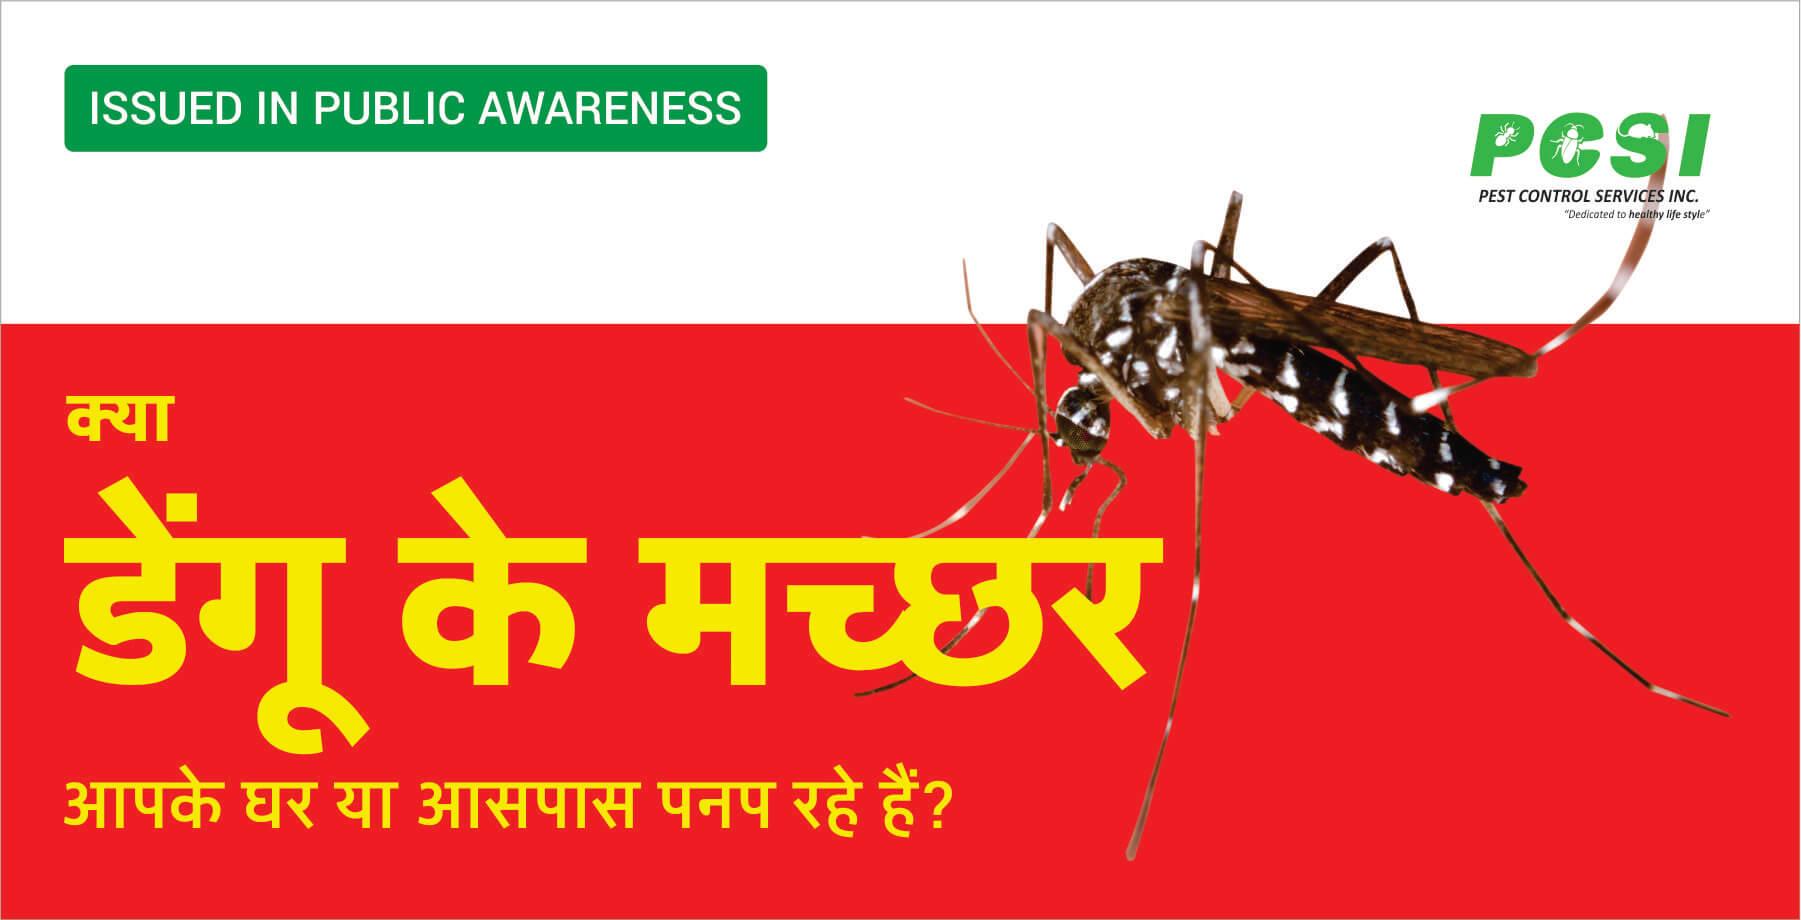 zika mosquito control service